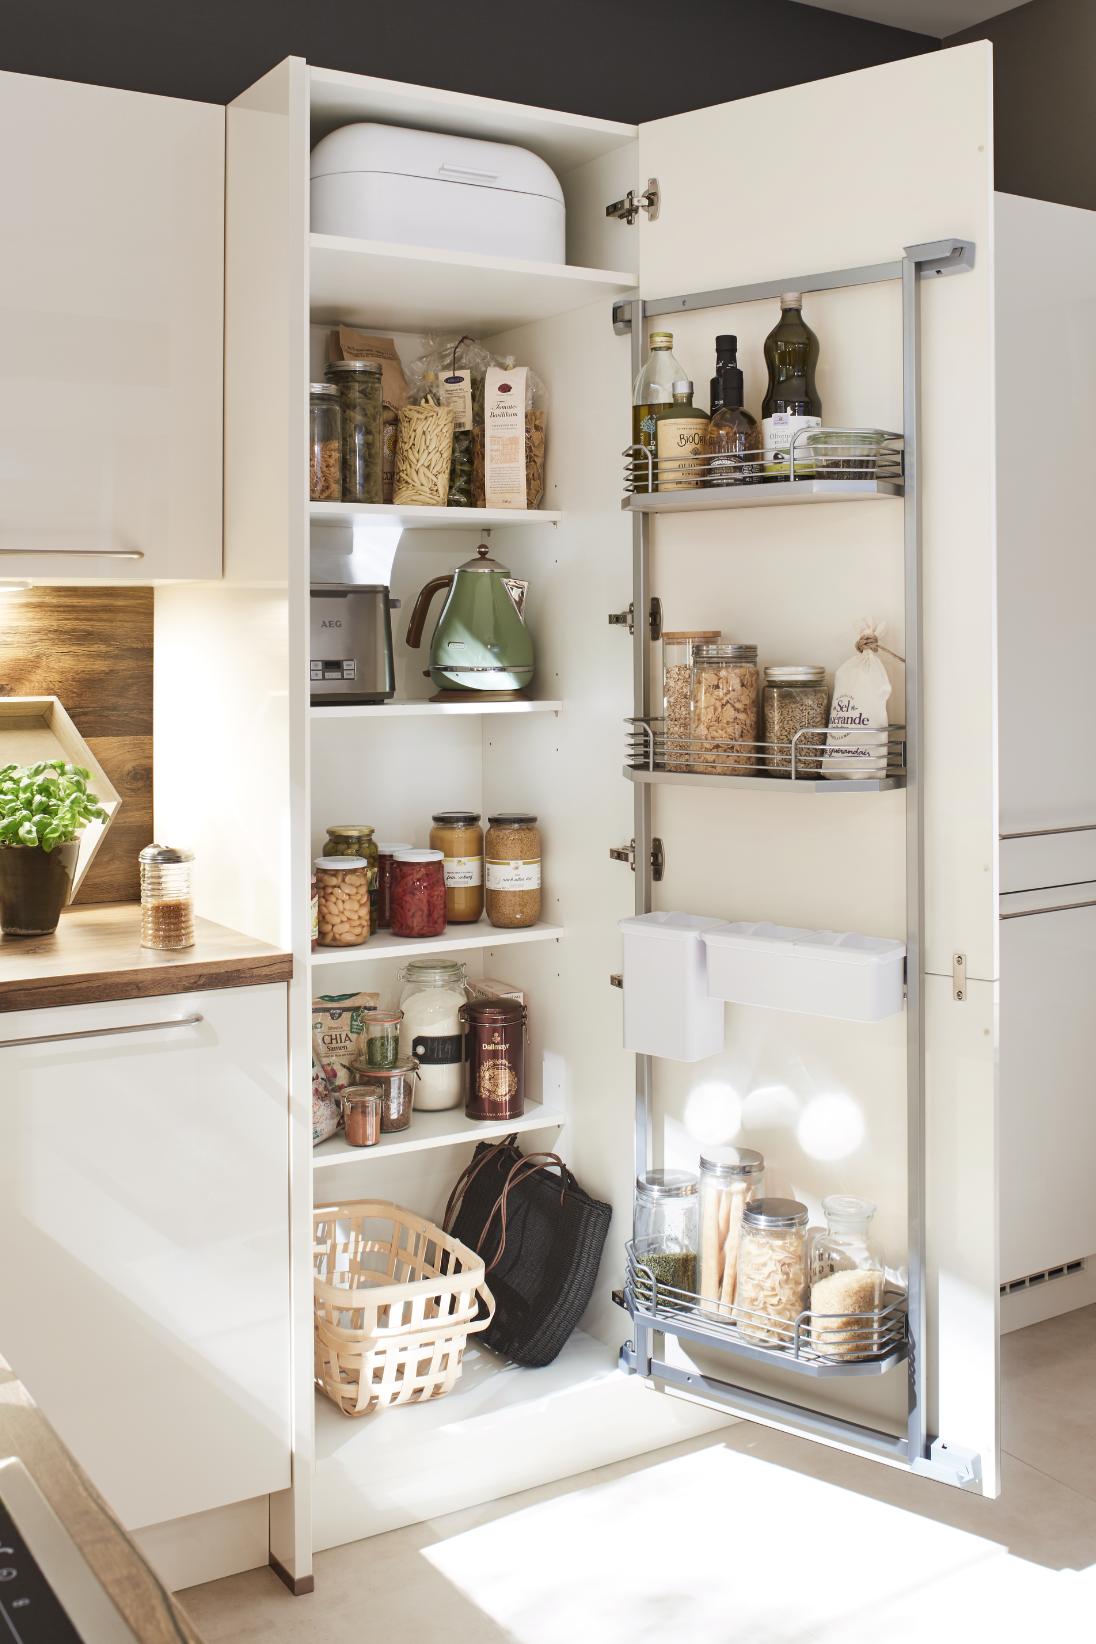 Cuisine Roda U Cuisinemoderne Interiordesign Deco Cuisine Blanc Cuisine Moderne Cuisine Blanche Et Bois Maison